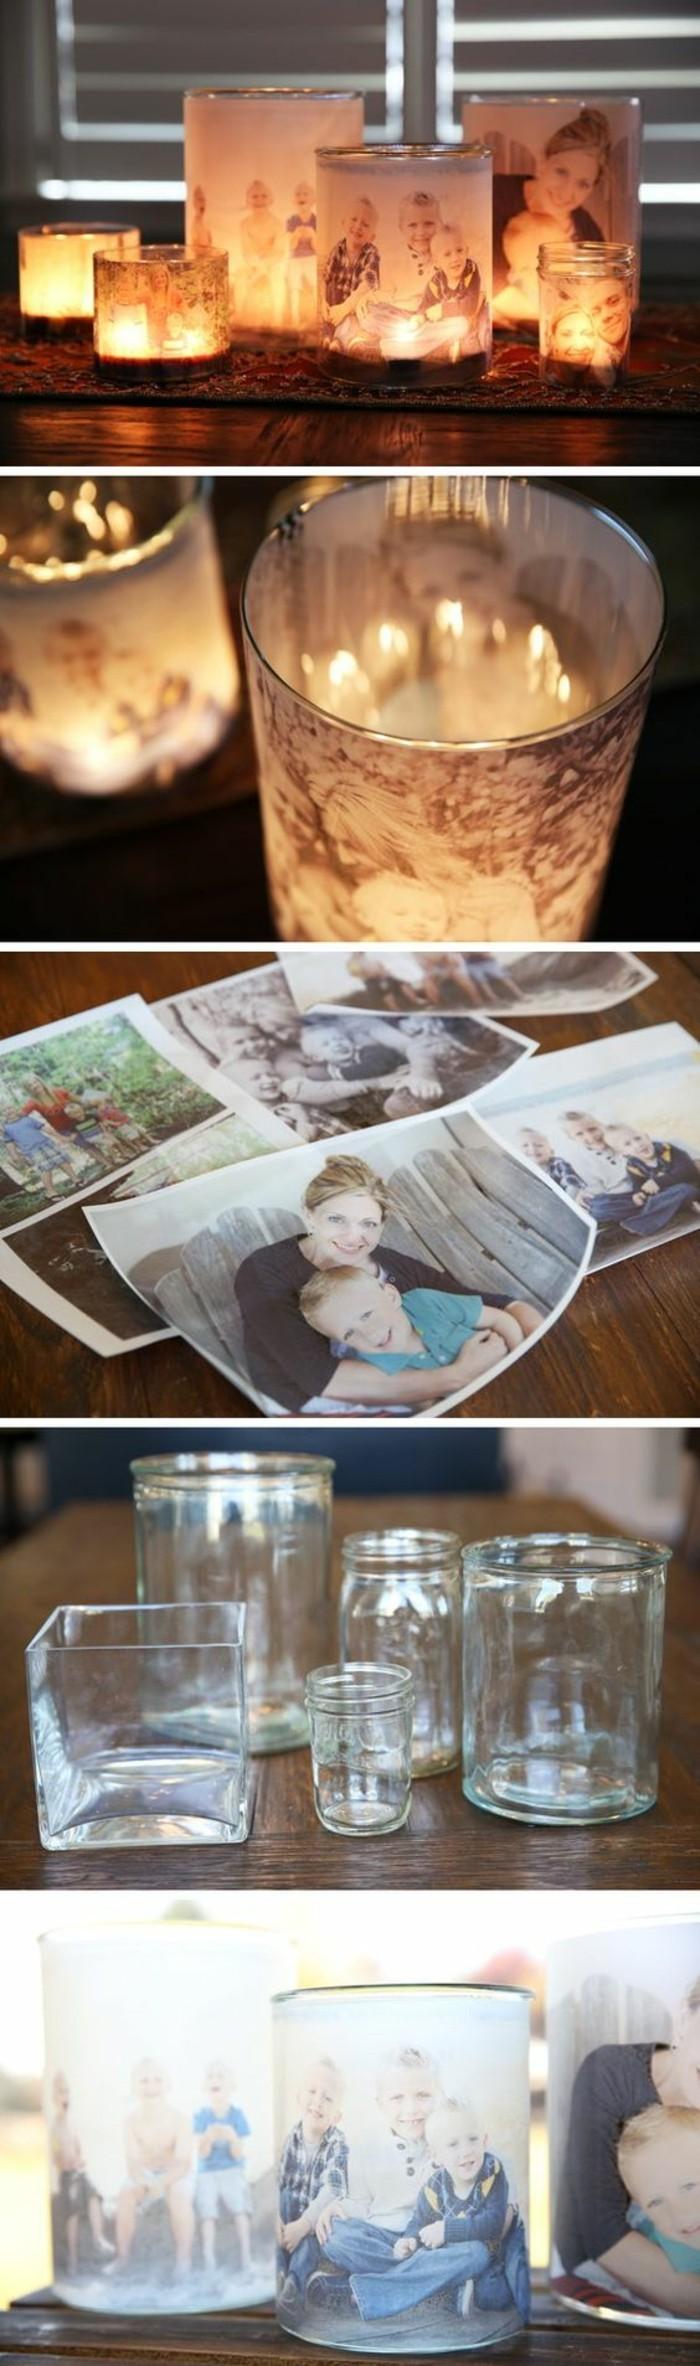 Portacandele con foto, idee regalo anniversario per lui